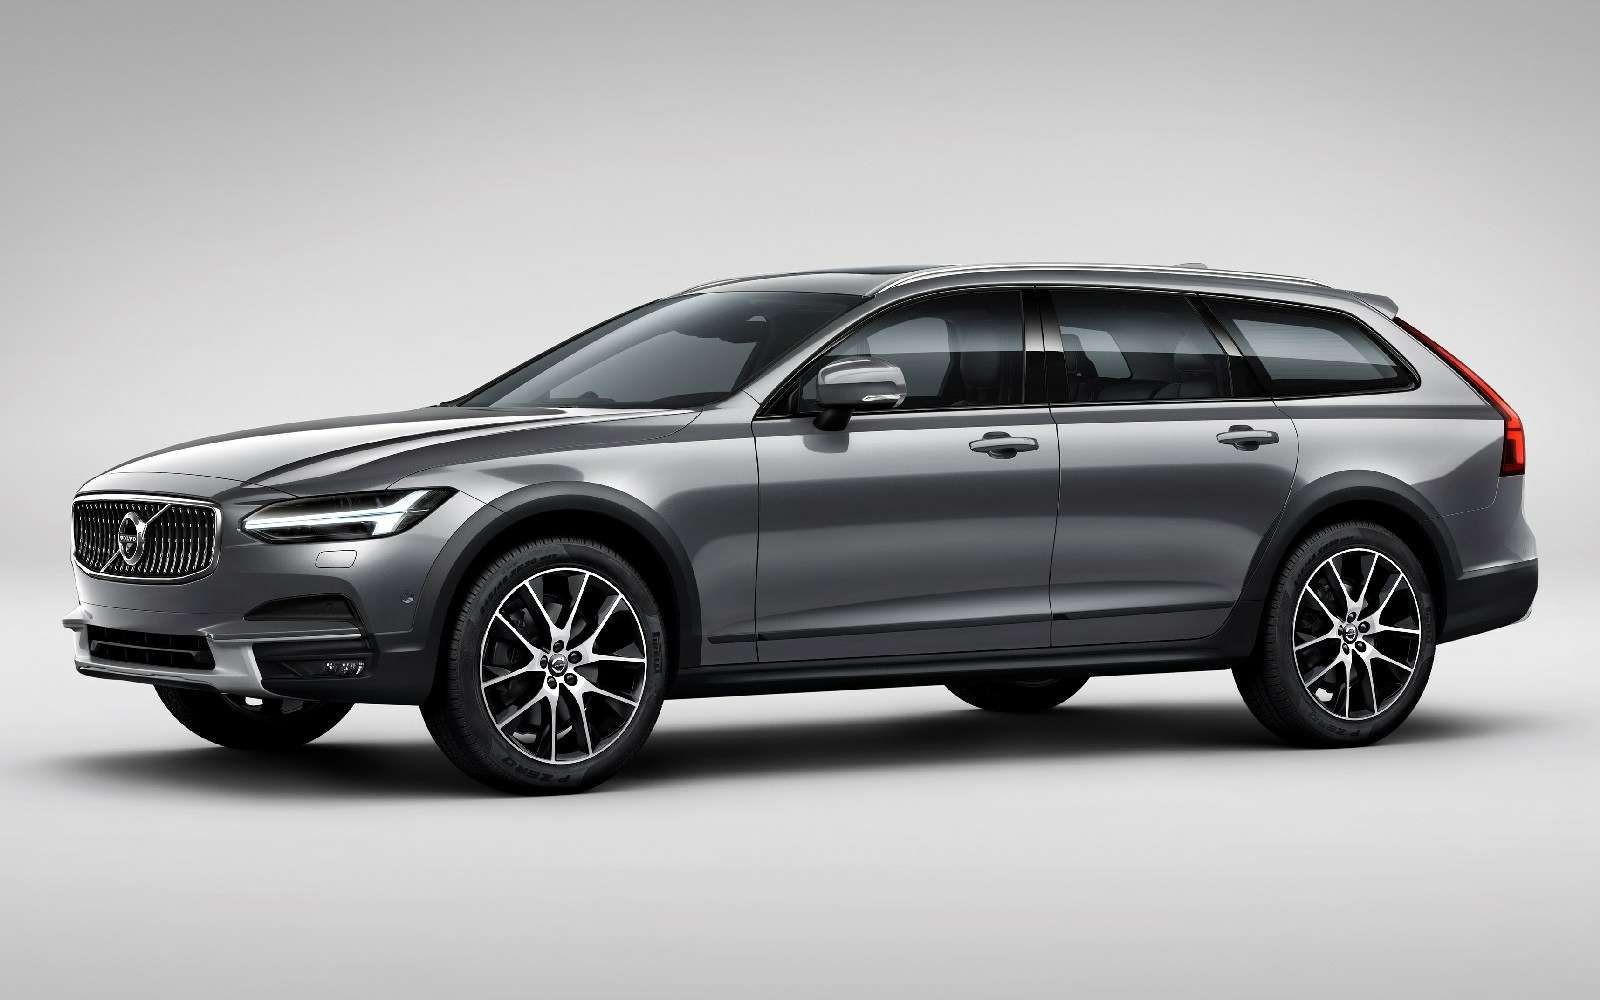 Такой «сарай» нам нужен: Volvo V90 Cross Country представлен официально— фото 635270